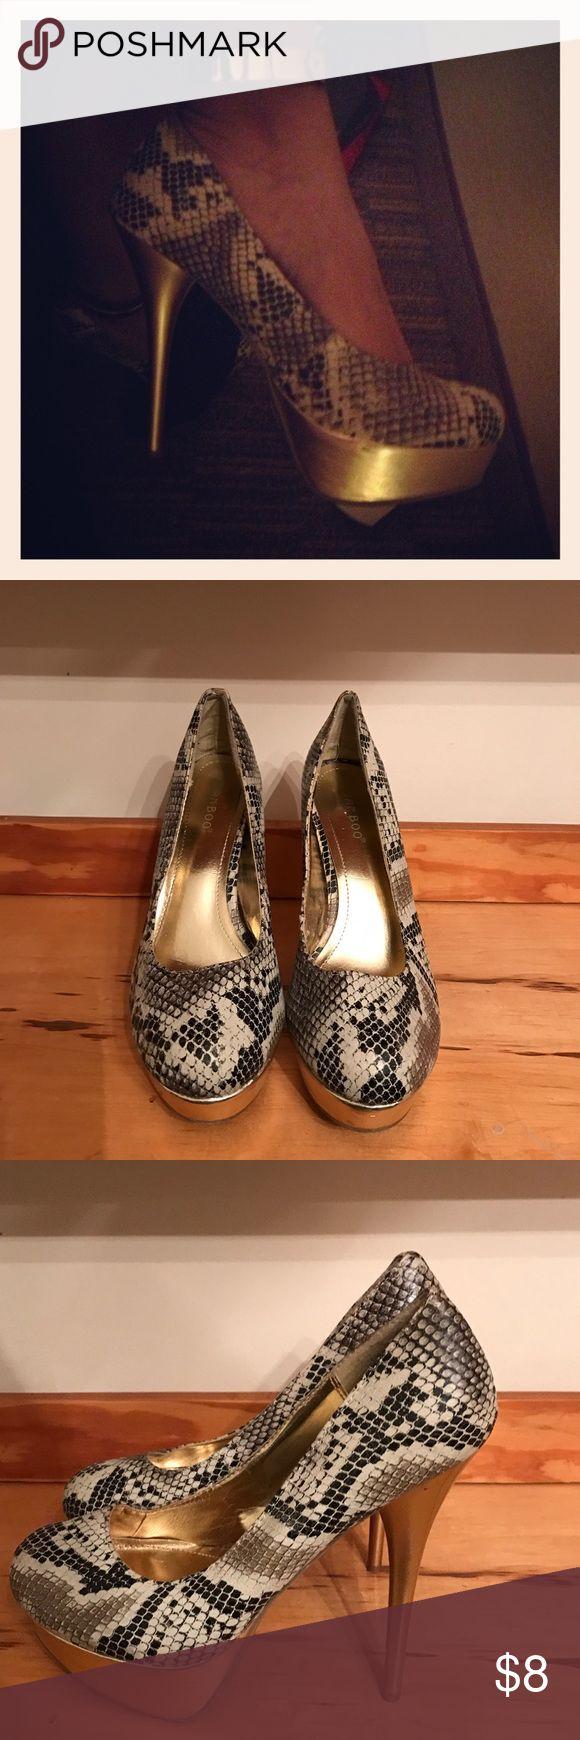 Gold Python Print Platform Heels Make a statement in these gold Bamboo python print platform pumps! Shoes Platforms